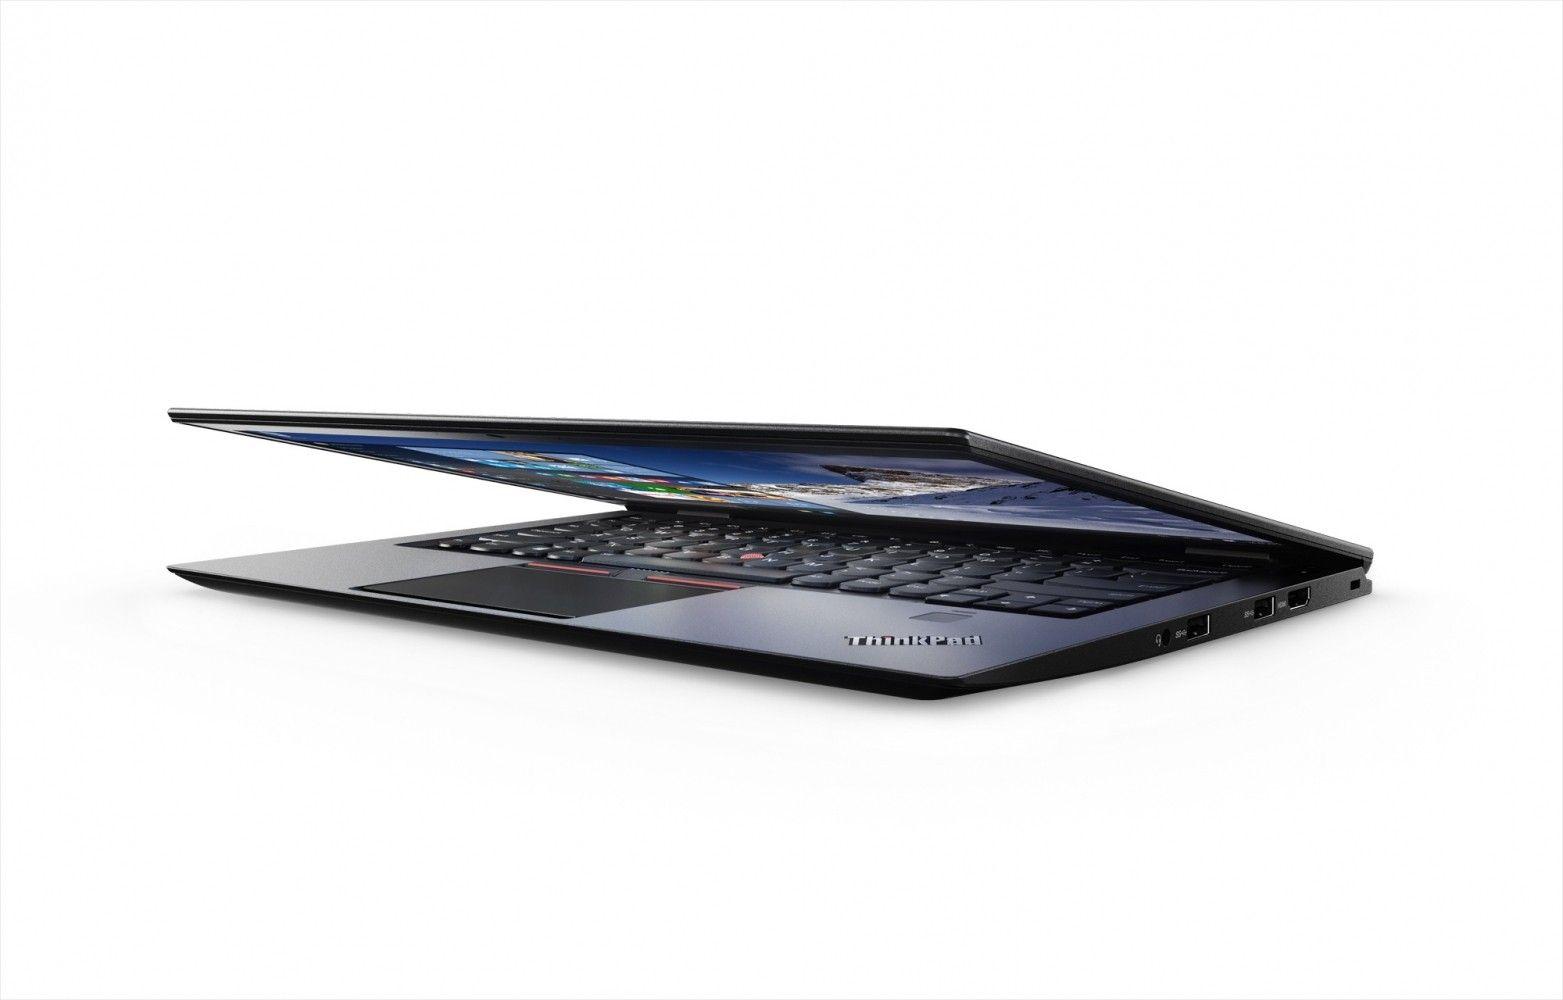 Ноутбук LENOVO ThinkPad X1 Carbon G4 (20FBS02E00) - 4